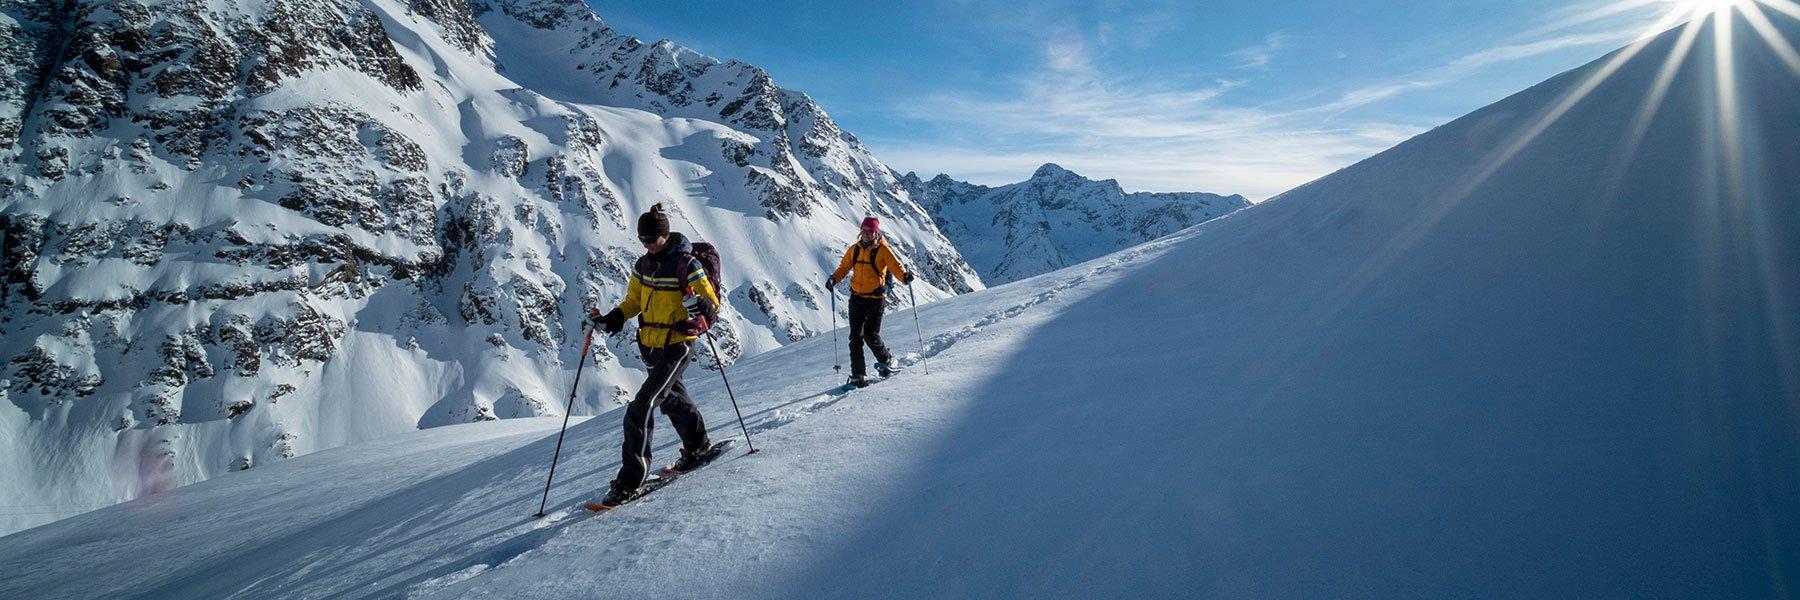 Schneeschuhwandern in Längenfeld